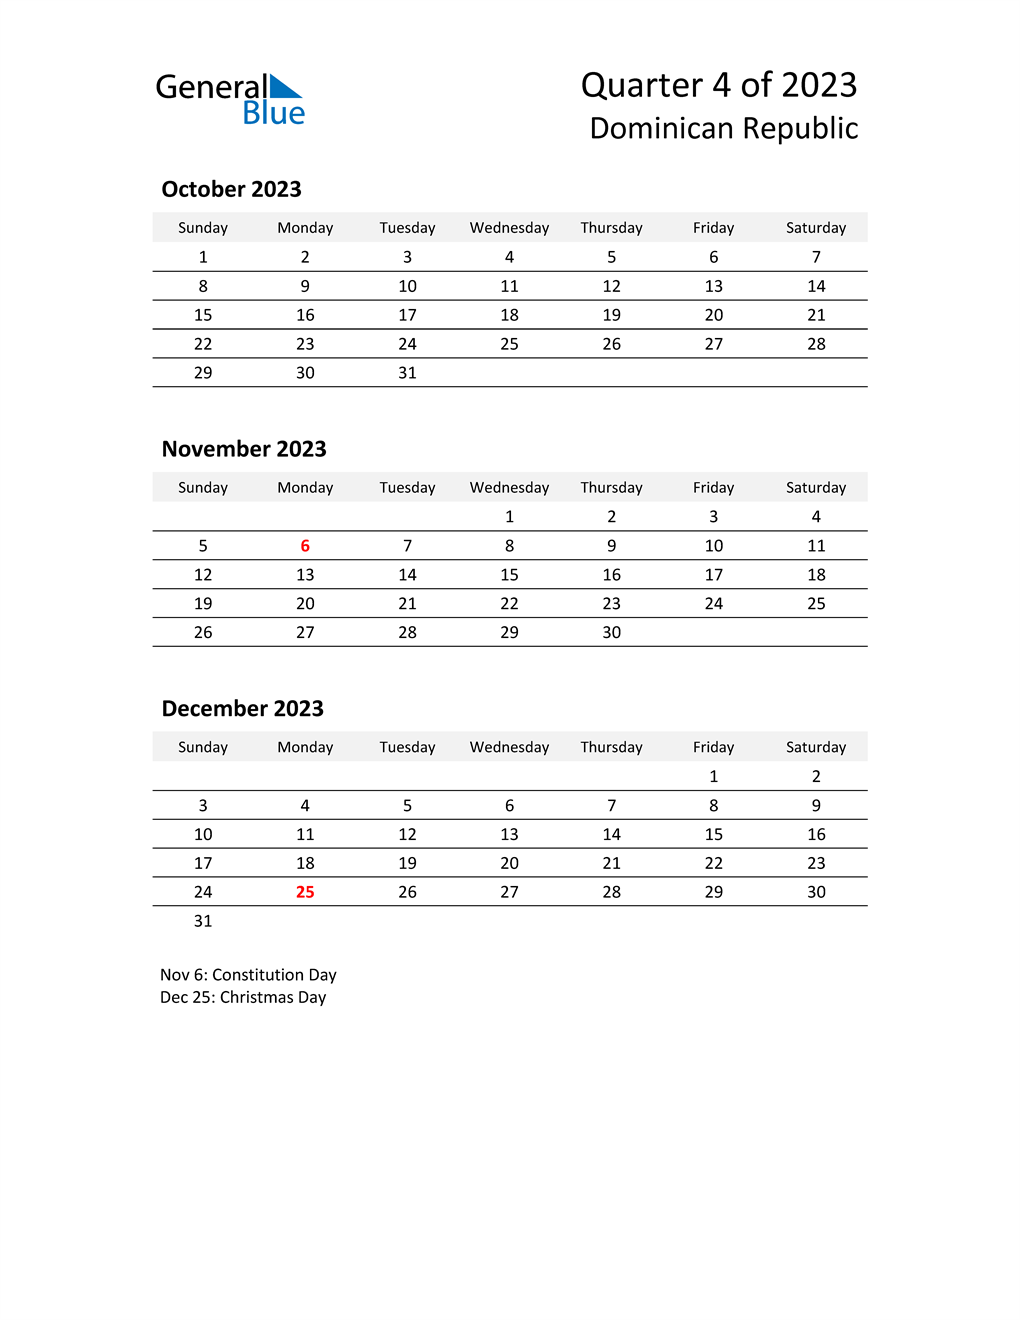 2023 Three-Month Calendar for Dominican Republic